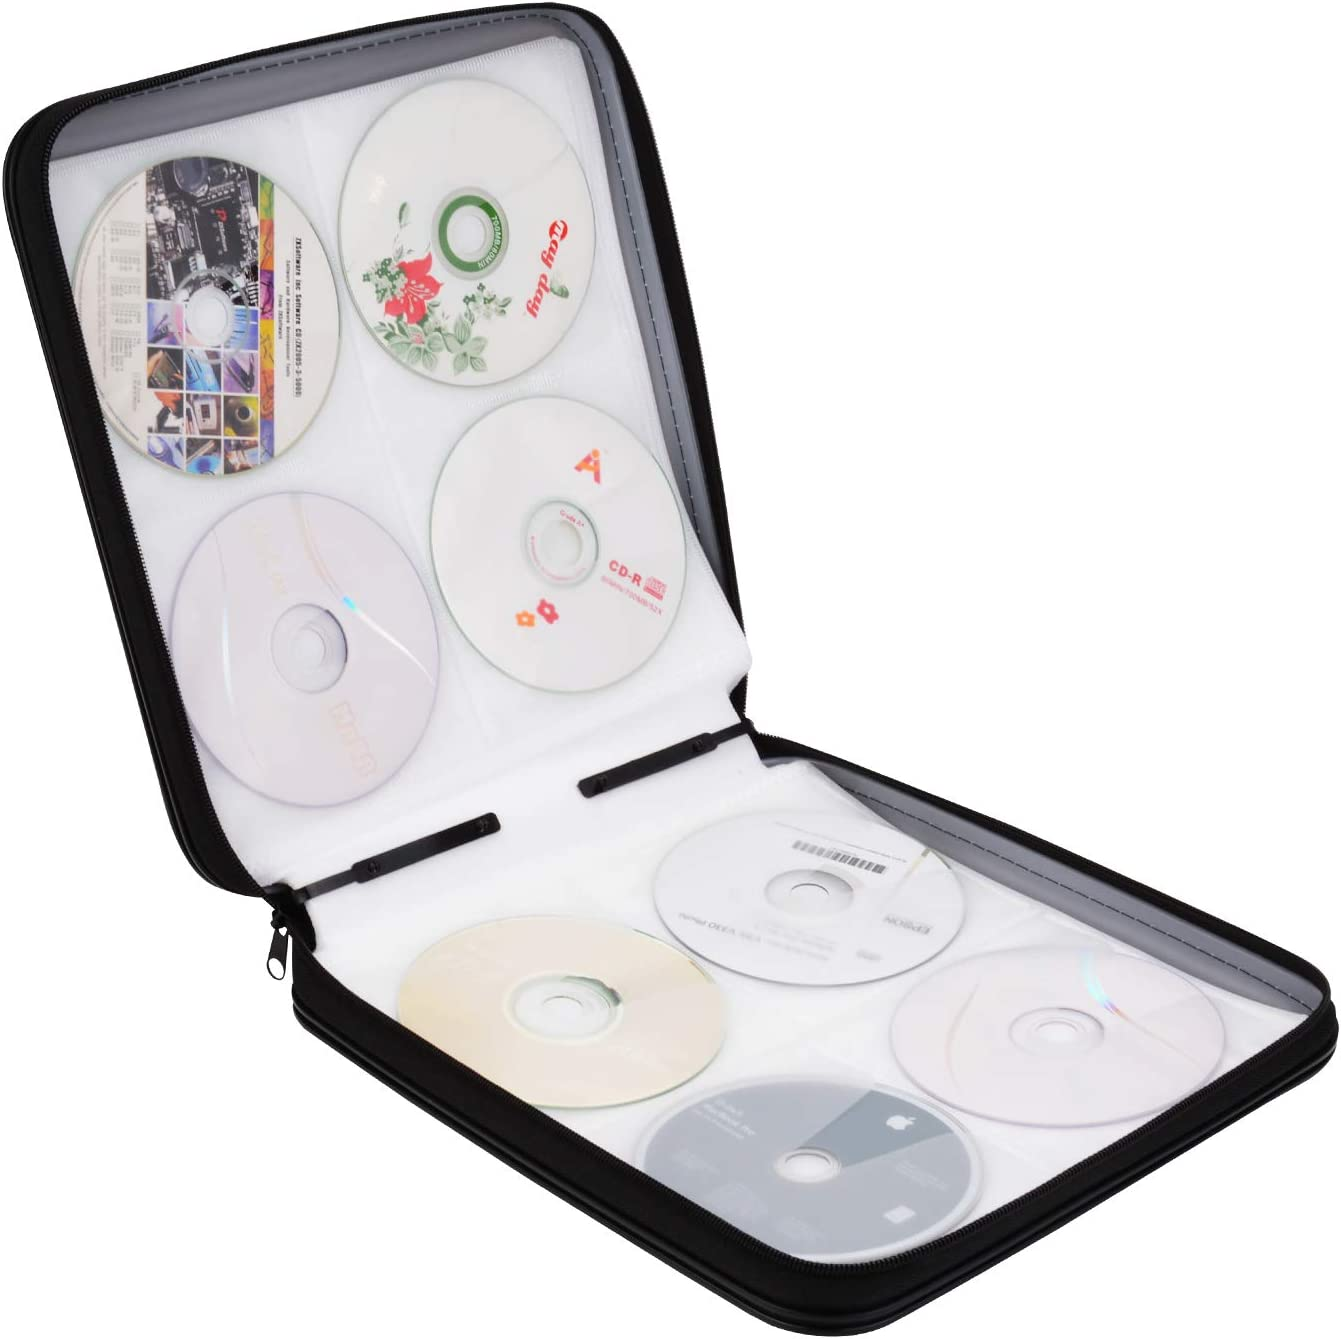 Bageek Pochette Cd Range Cd 160 Pcs Classeur Cd Pochette Dvd Range Dvd Classeur Dvd En Plastique Amazon Fr Informatique